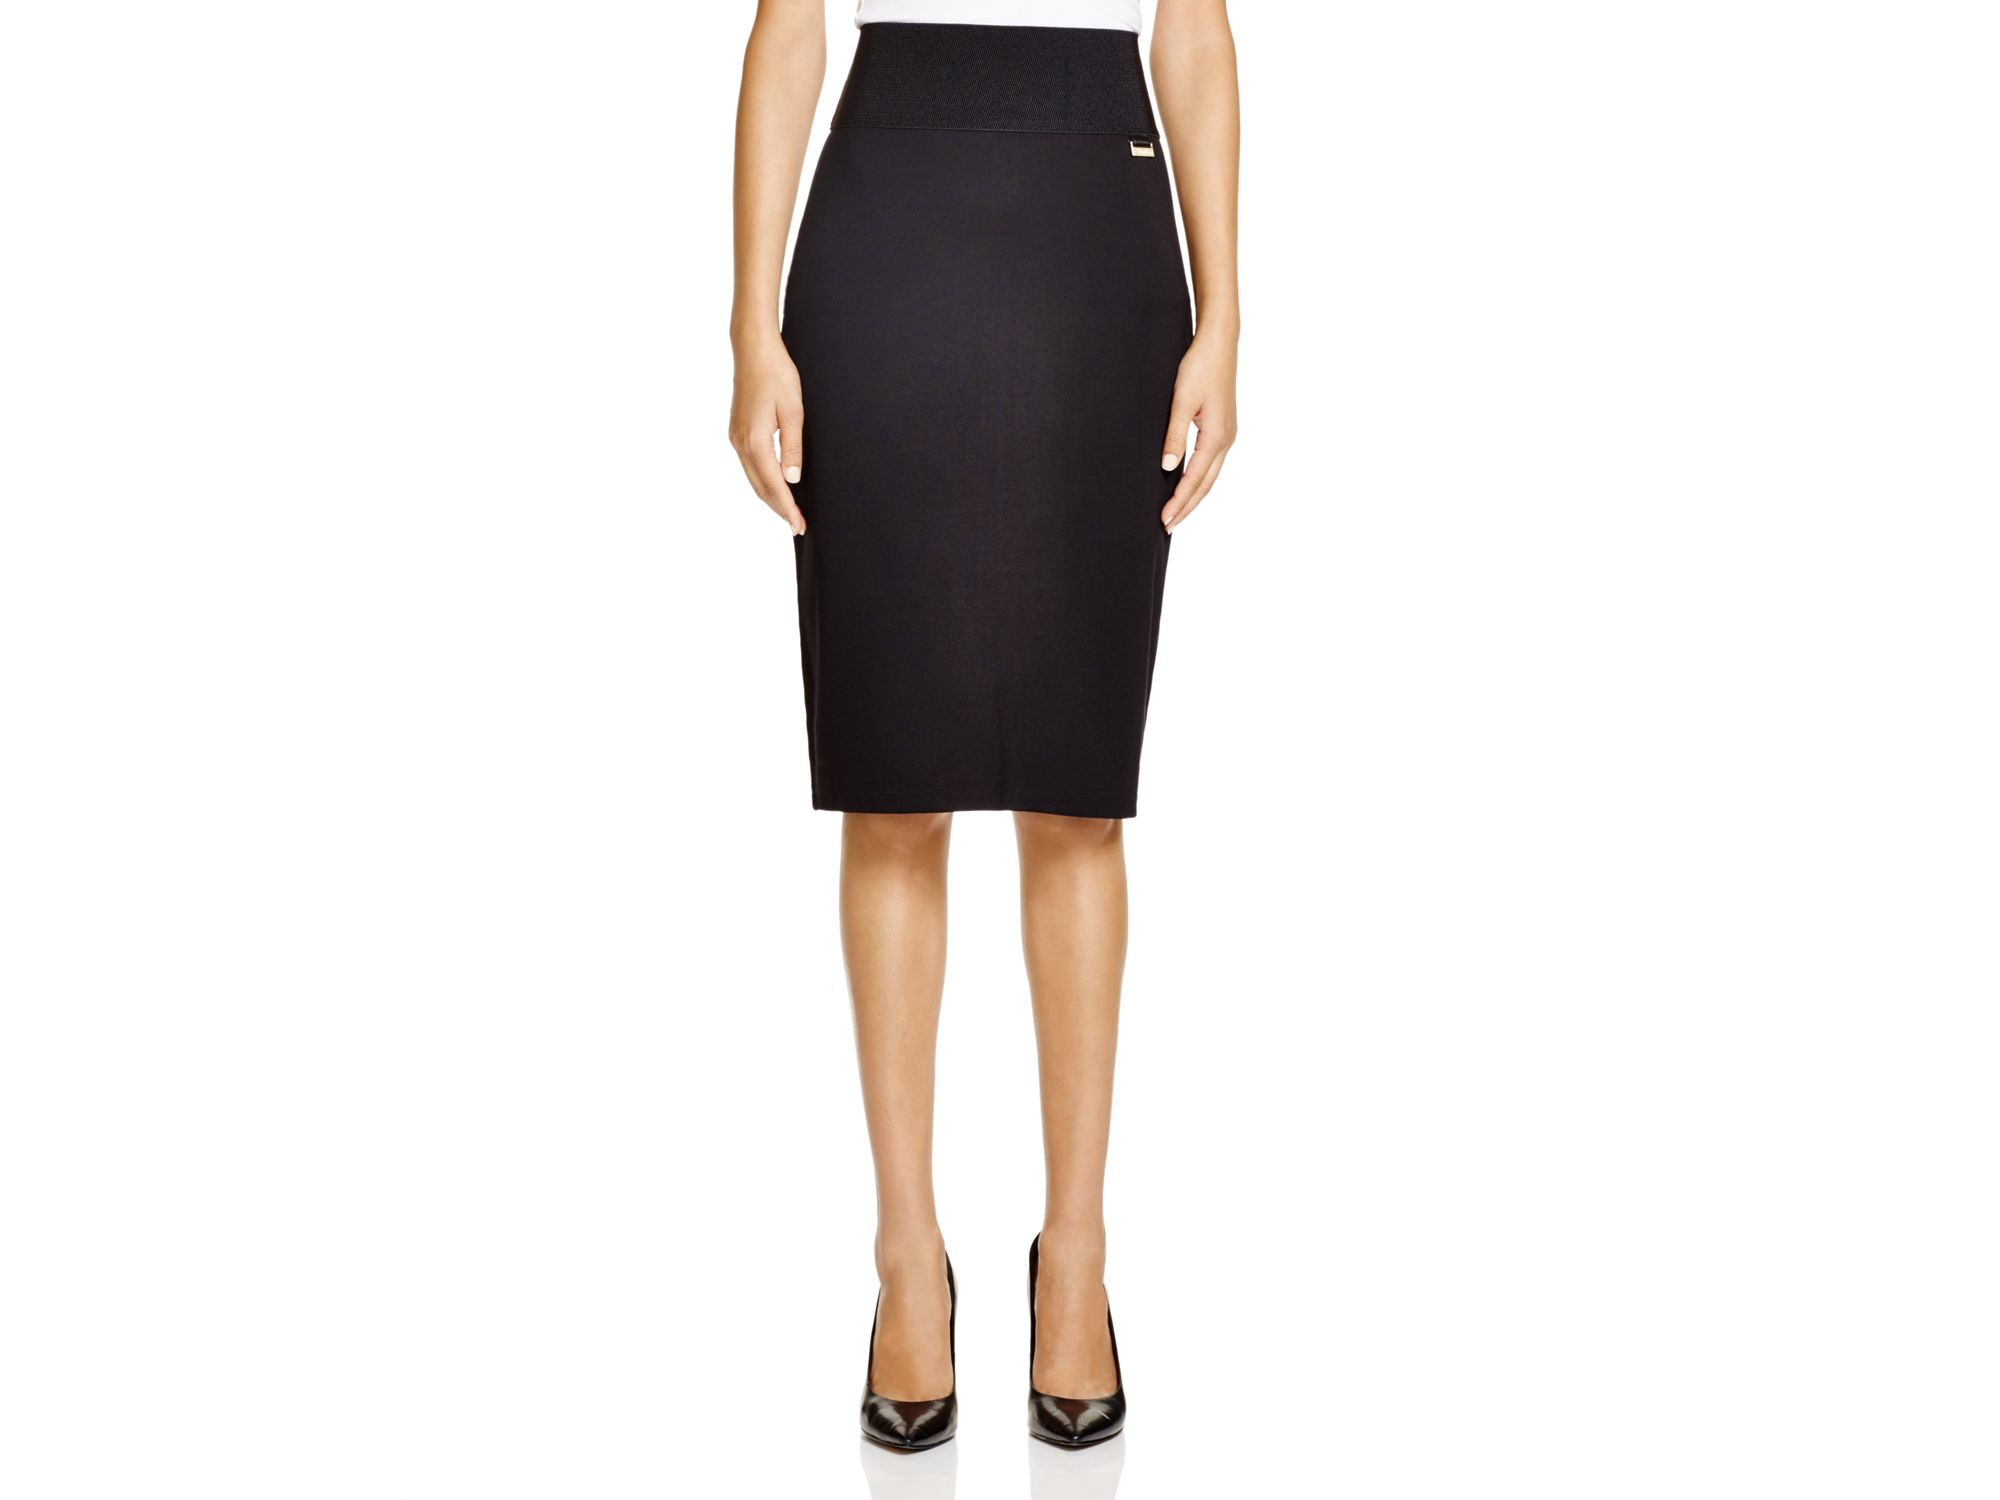 calvin klein pencil skirt in black lyst